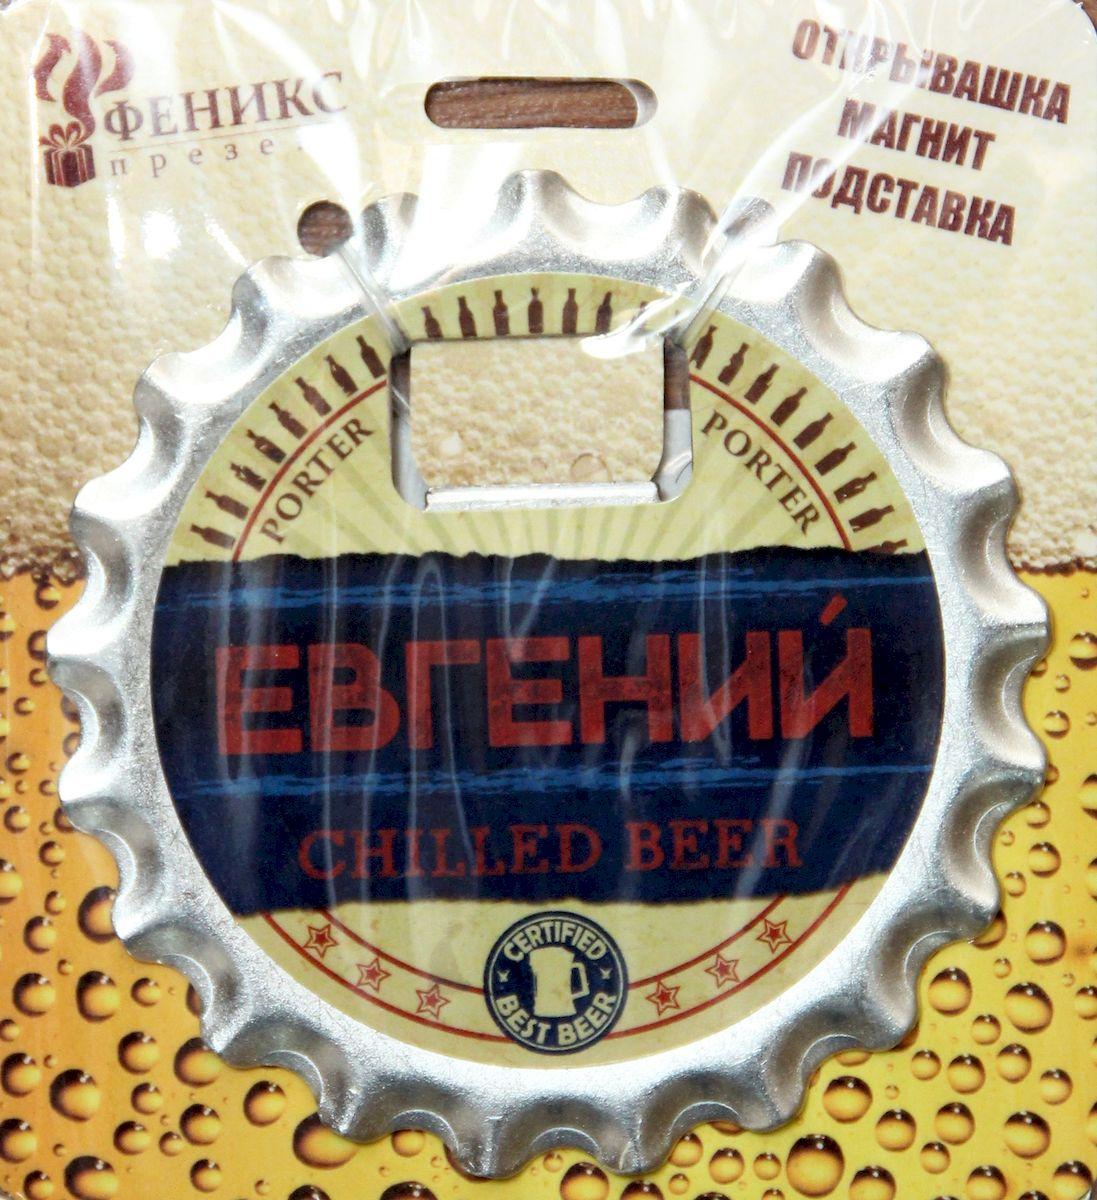 Ключ для открывания бутылок Magic Home Евгений, с магнитом ключ для открывания бутылок magic home артем с магнитом